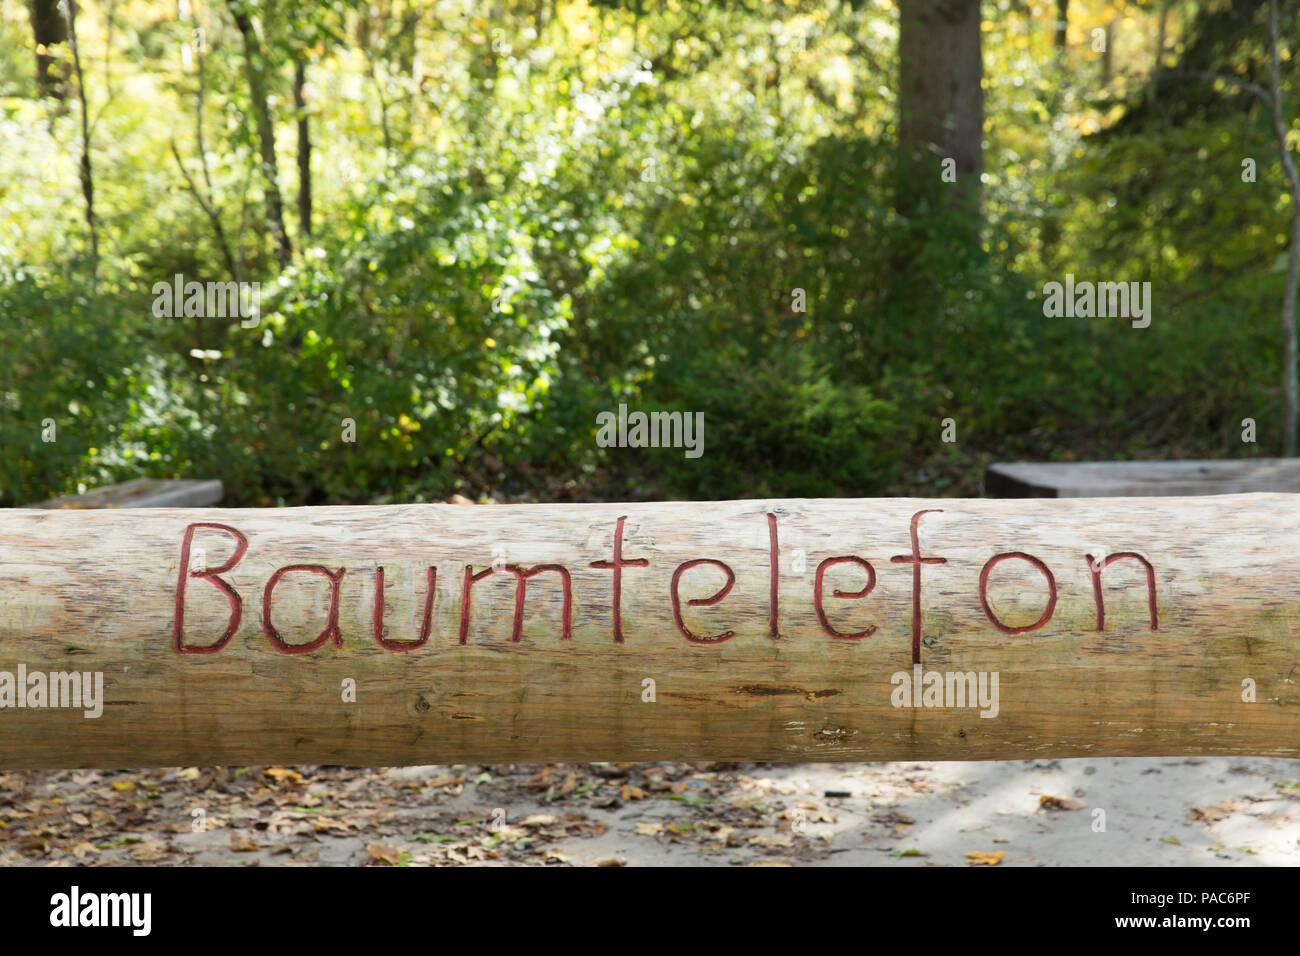 Tree telephone, autumnal forest at Forest Experience Centre Ziegelwiesen, Füssen, Bavaria, Germany Stock Photo